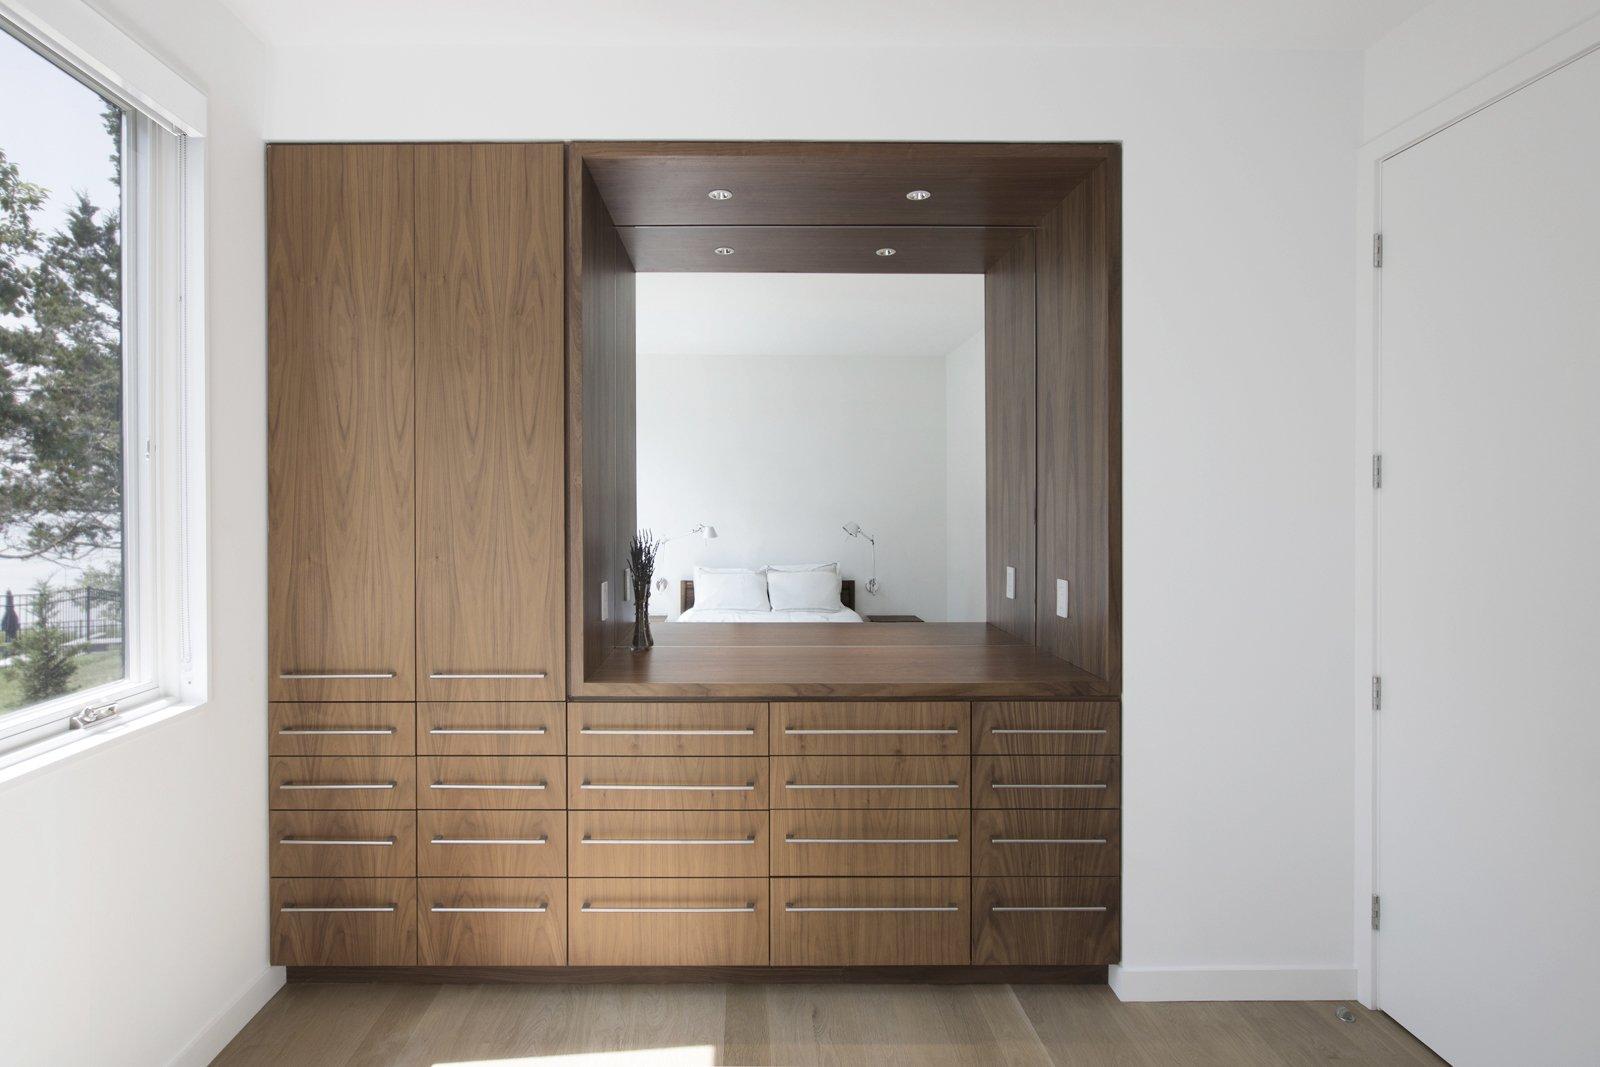 Bedroom, Wardrobe, Ceiling Lighting, Night Stands, Dresser, and Light Hardwood Floor Bedroom details  North Fork Bluff House by Resolution: 4 Architecture